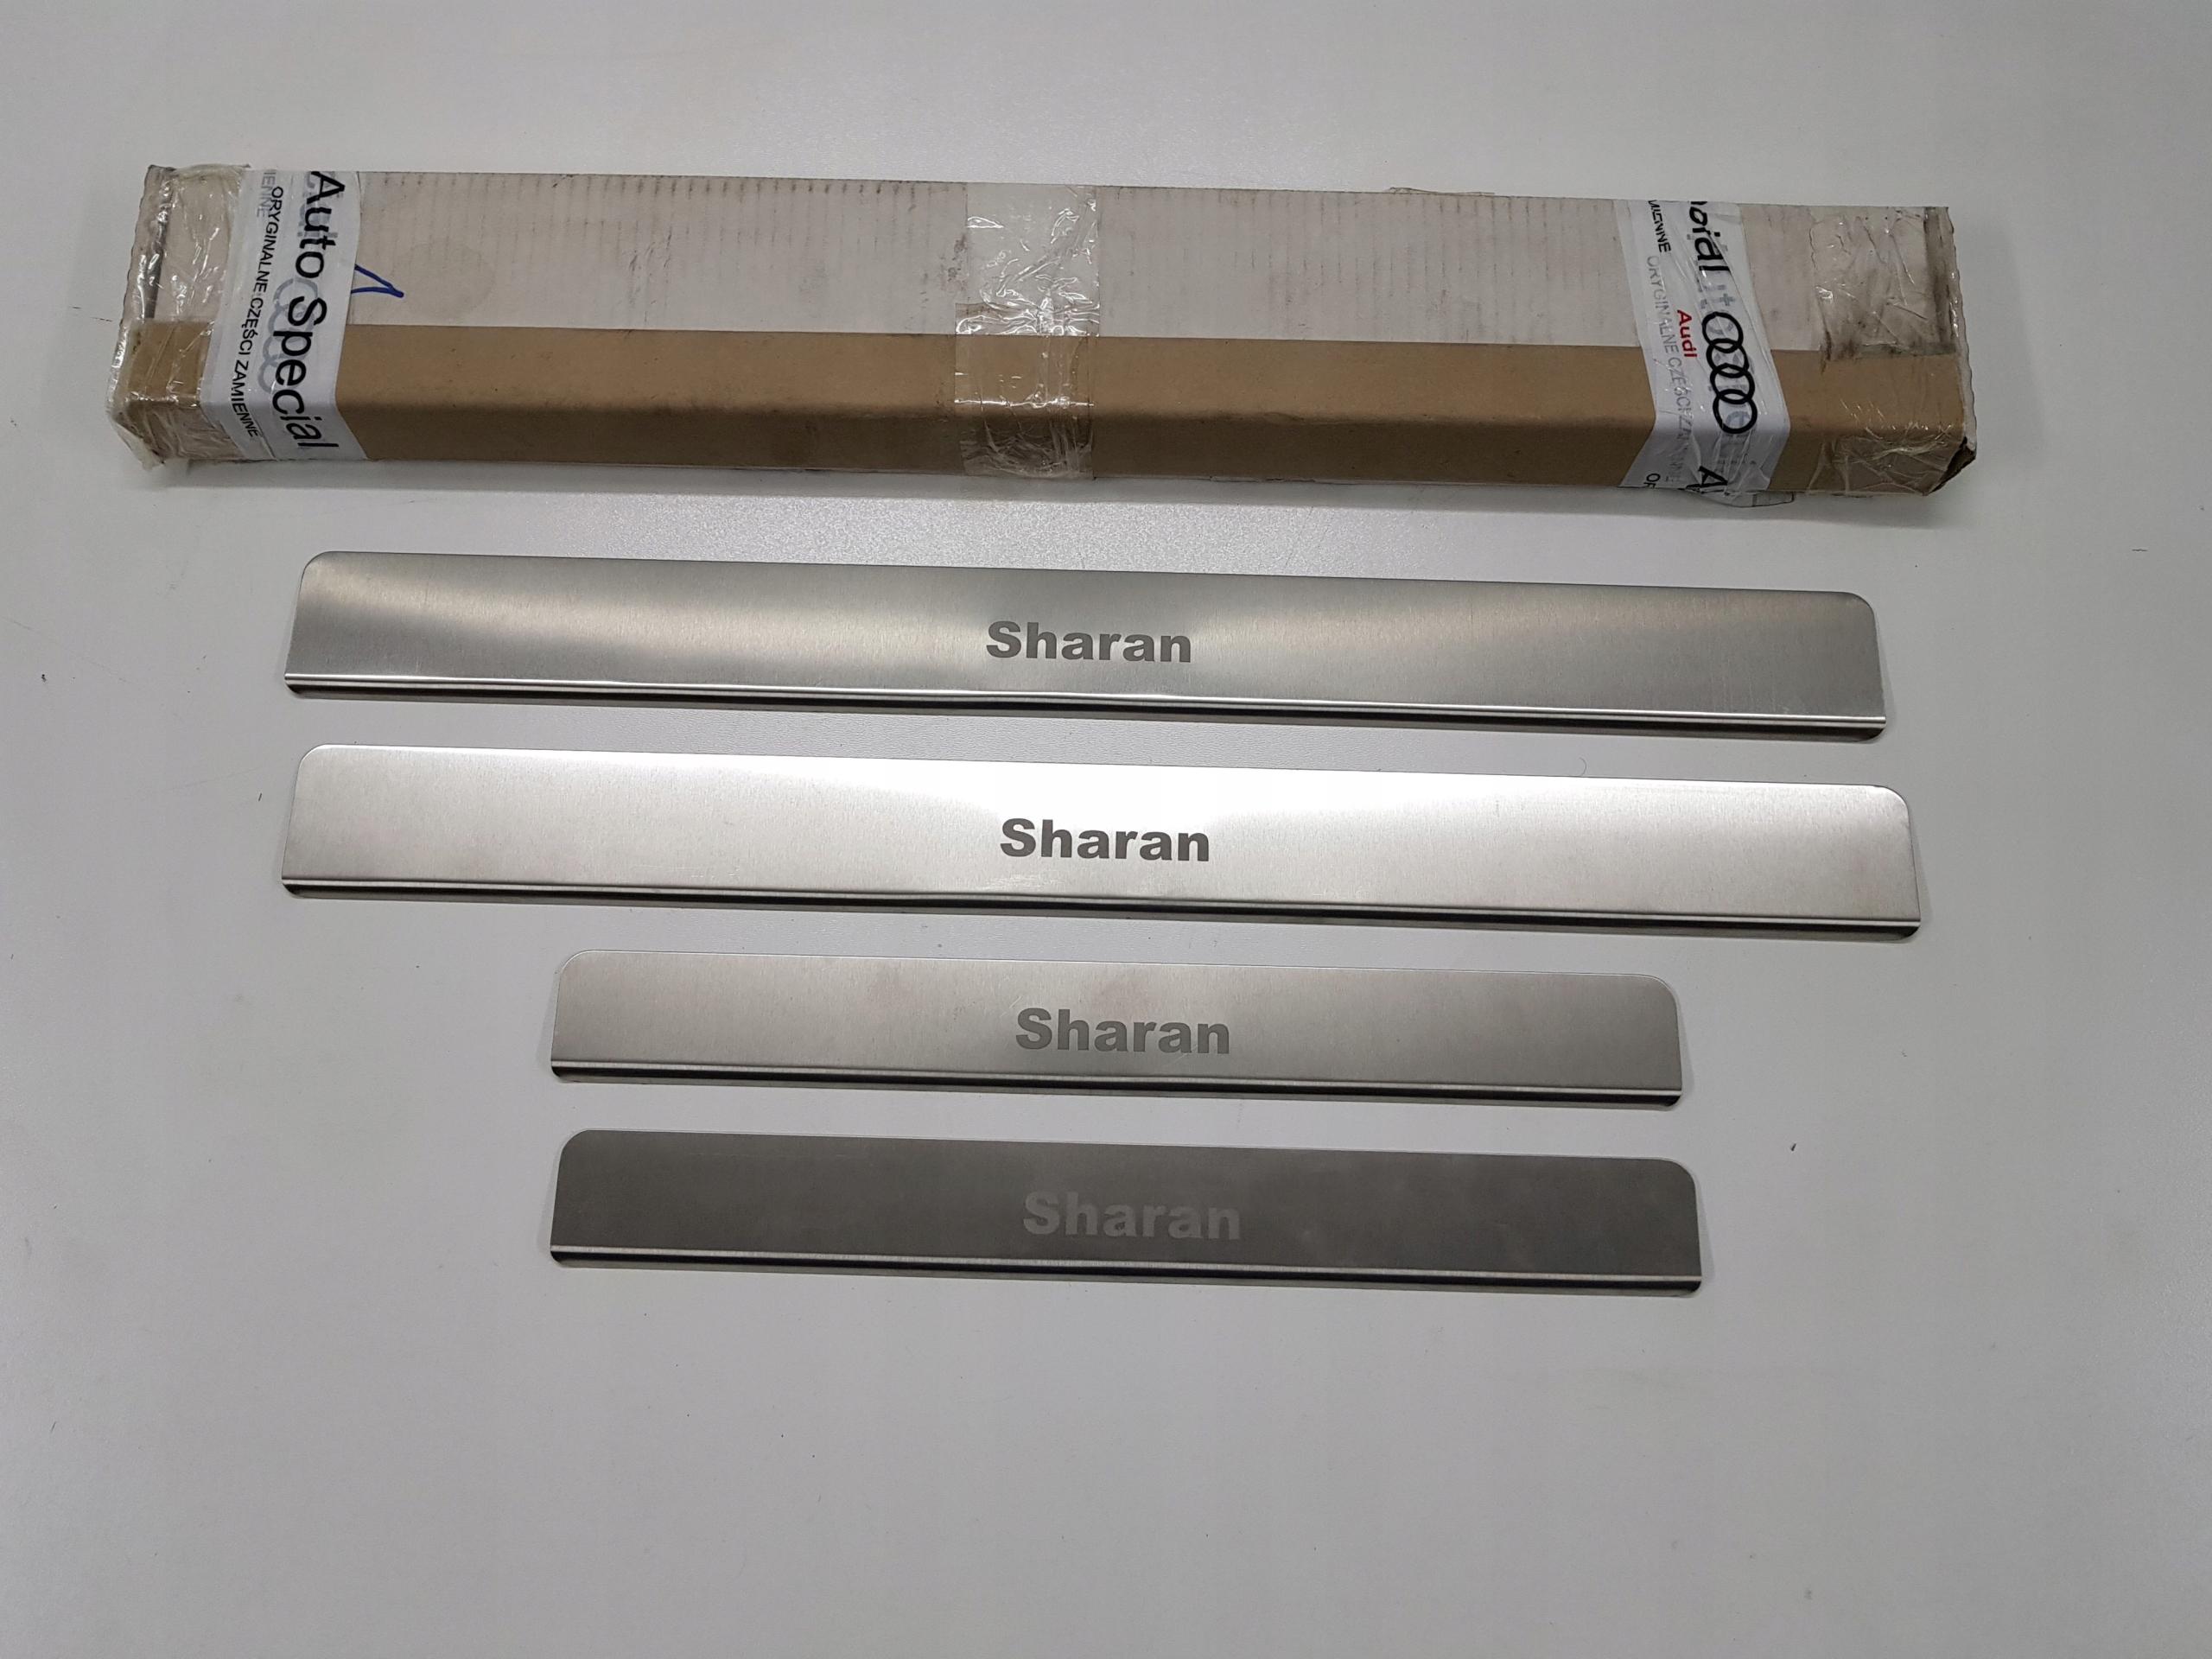 Listwy na progi VW Sharan 2010>> Oryginalne